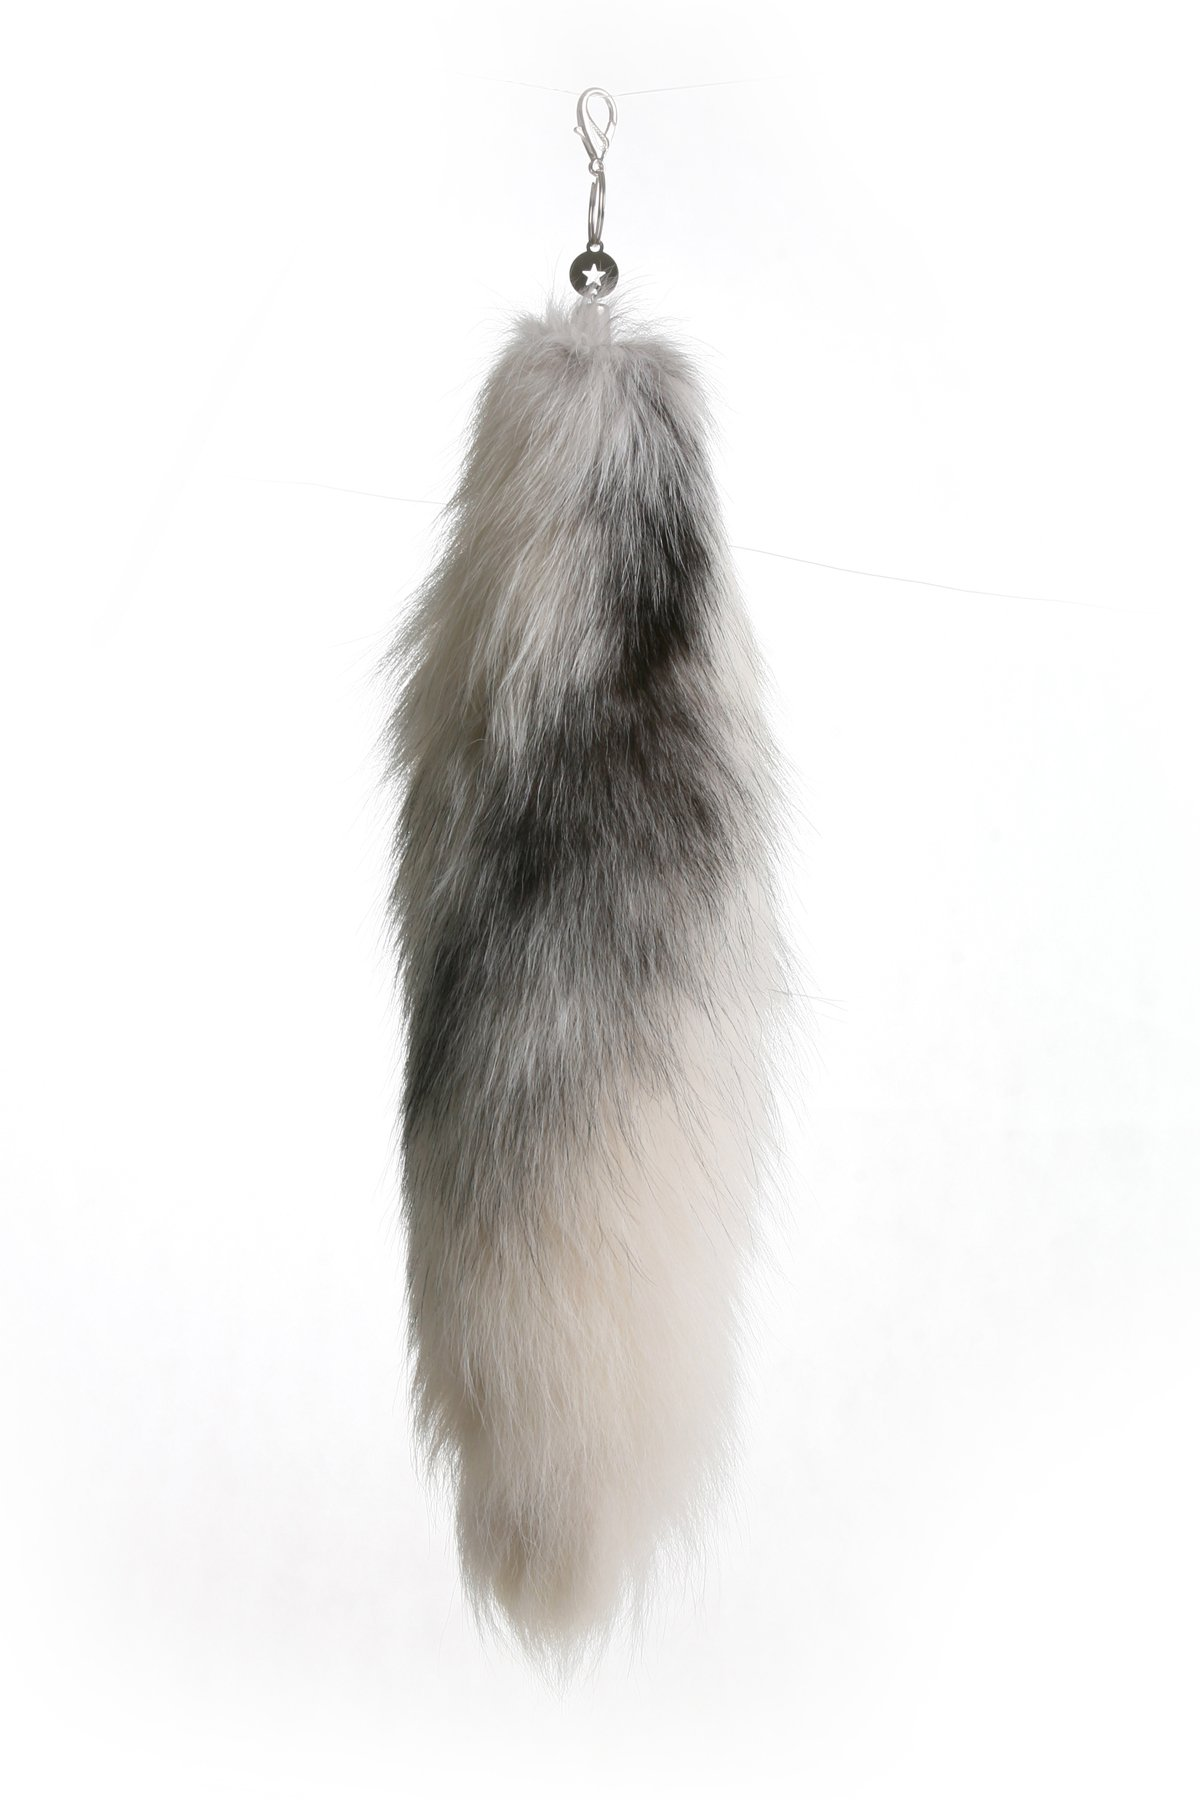 URSFUR 20'' Fluffy White Gray Fox Tail Fur Keychain Cosplay Toy Car Bag Charm Tassel Key Chain Ring Hook Alopex Lagopus Handbag Accessories